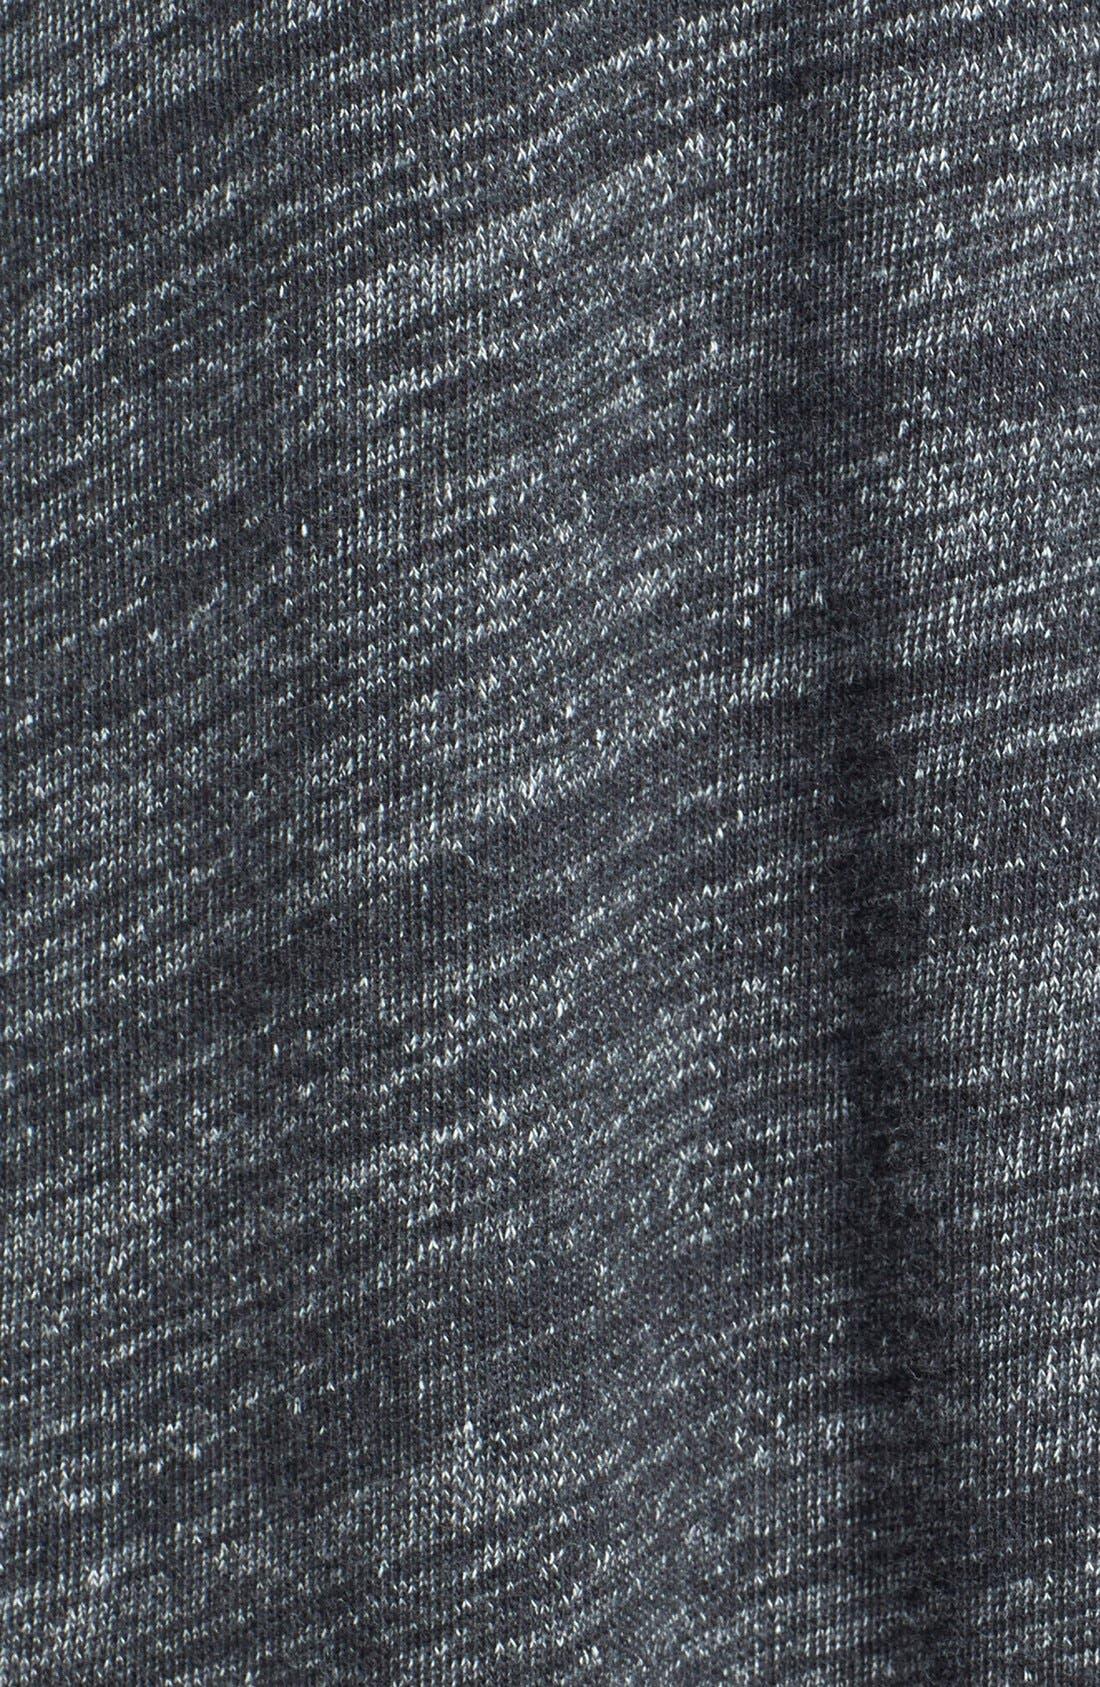 Alternate Image 3  - Unit-Y 'Game Changer' Pullover Hoodie